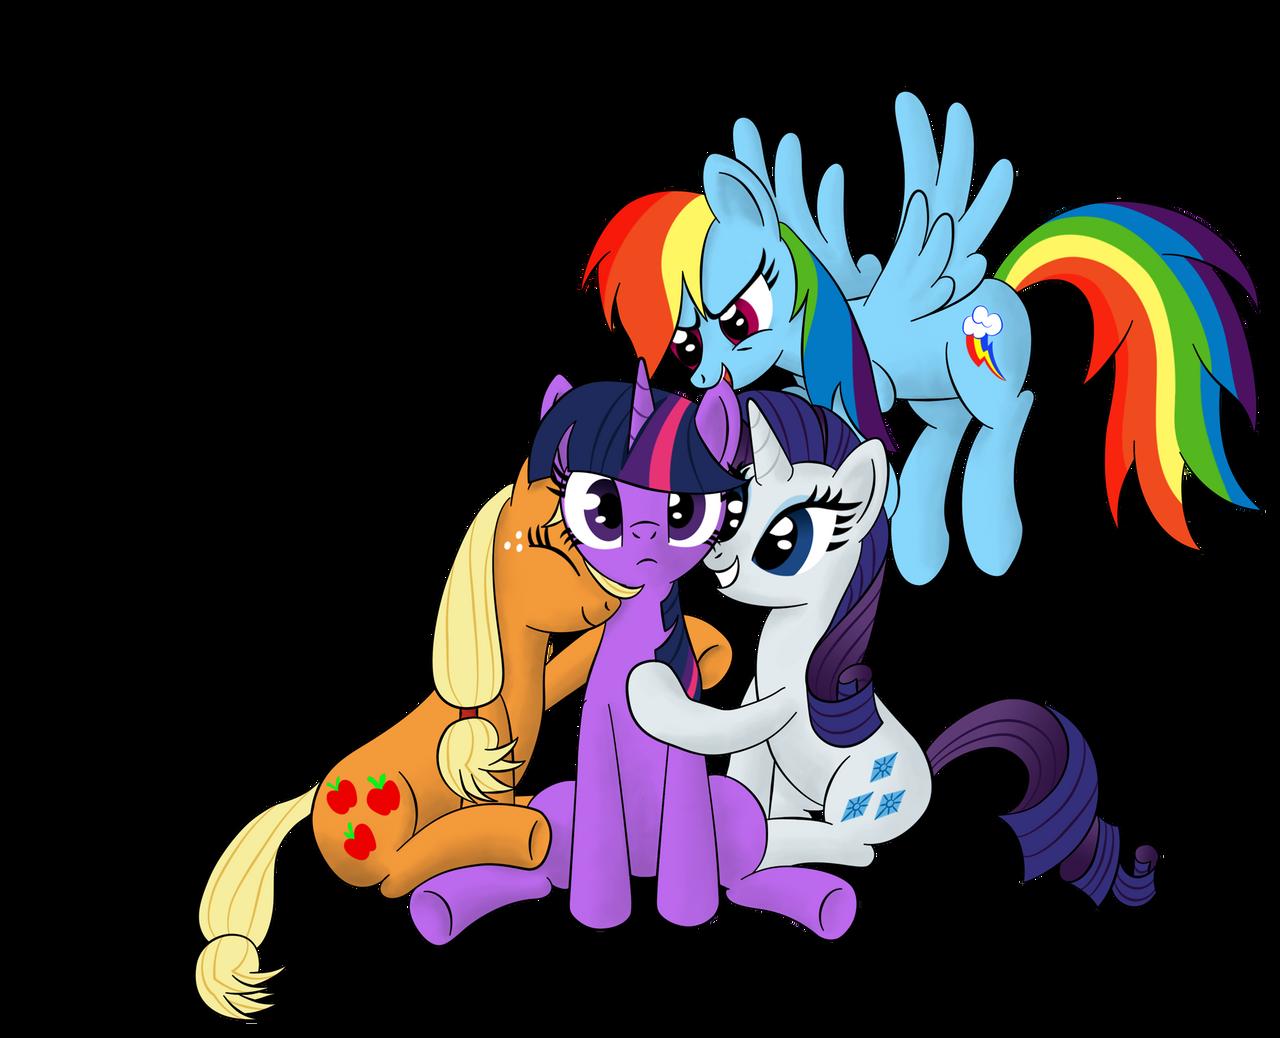 Everypony loves Twilight by furor1